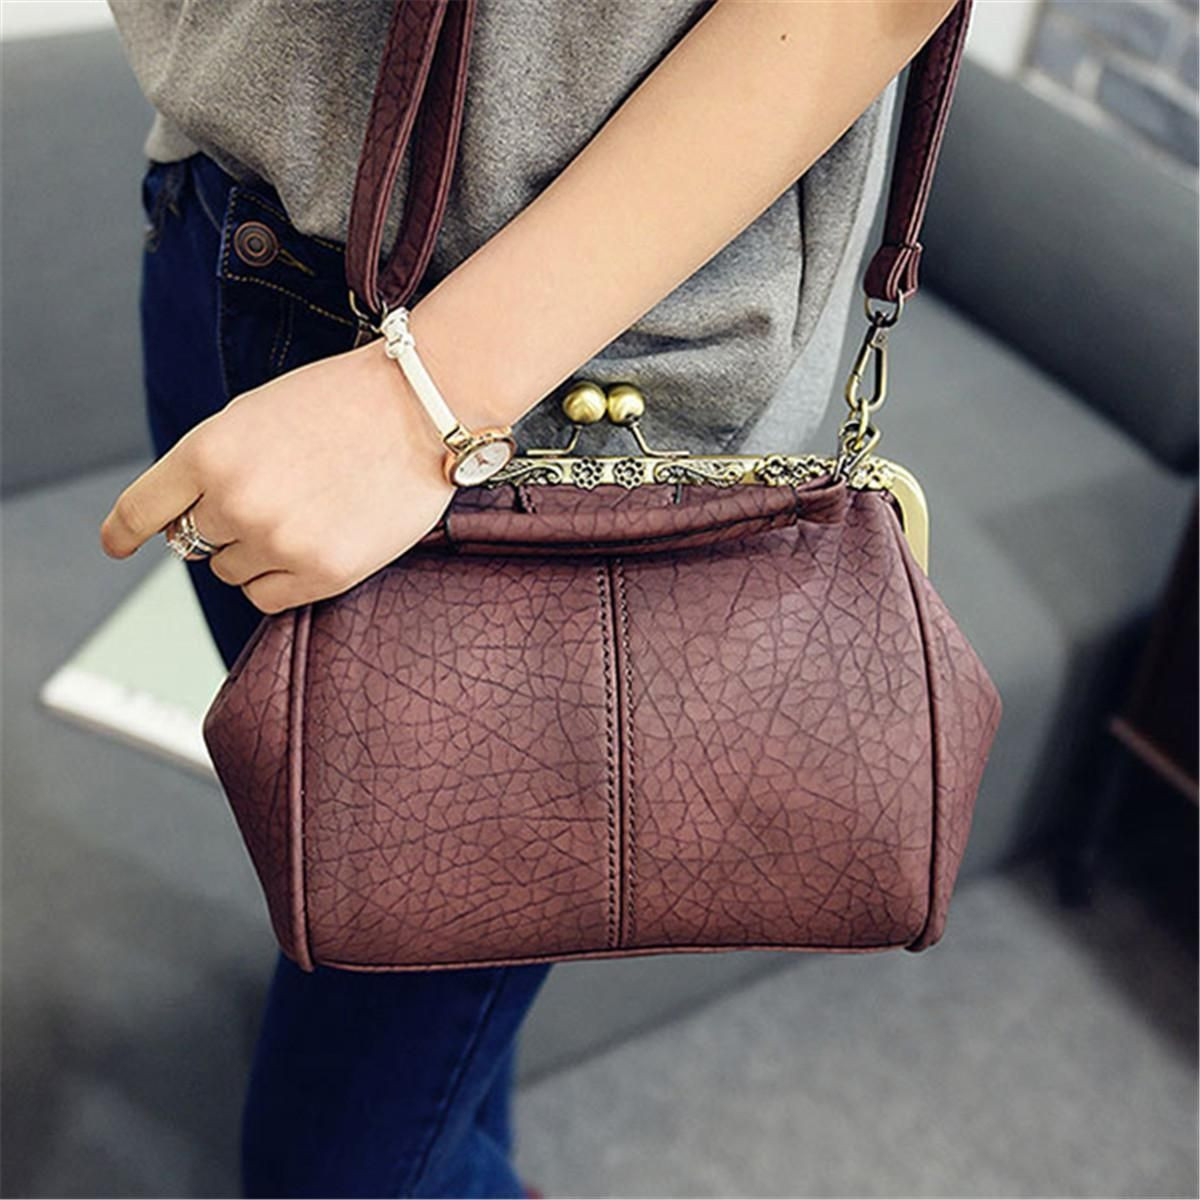 b373e12195ea Buy Generic Women Vintage Hasp Bucket Bags PU Leather Shoulder Bag  Crossbody Bag in Egypt